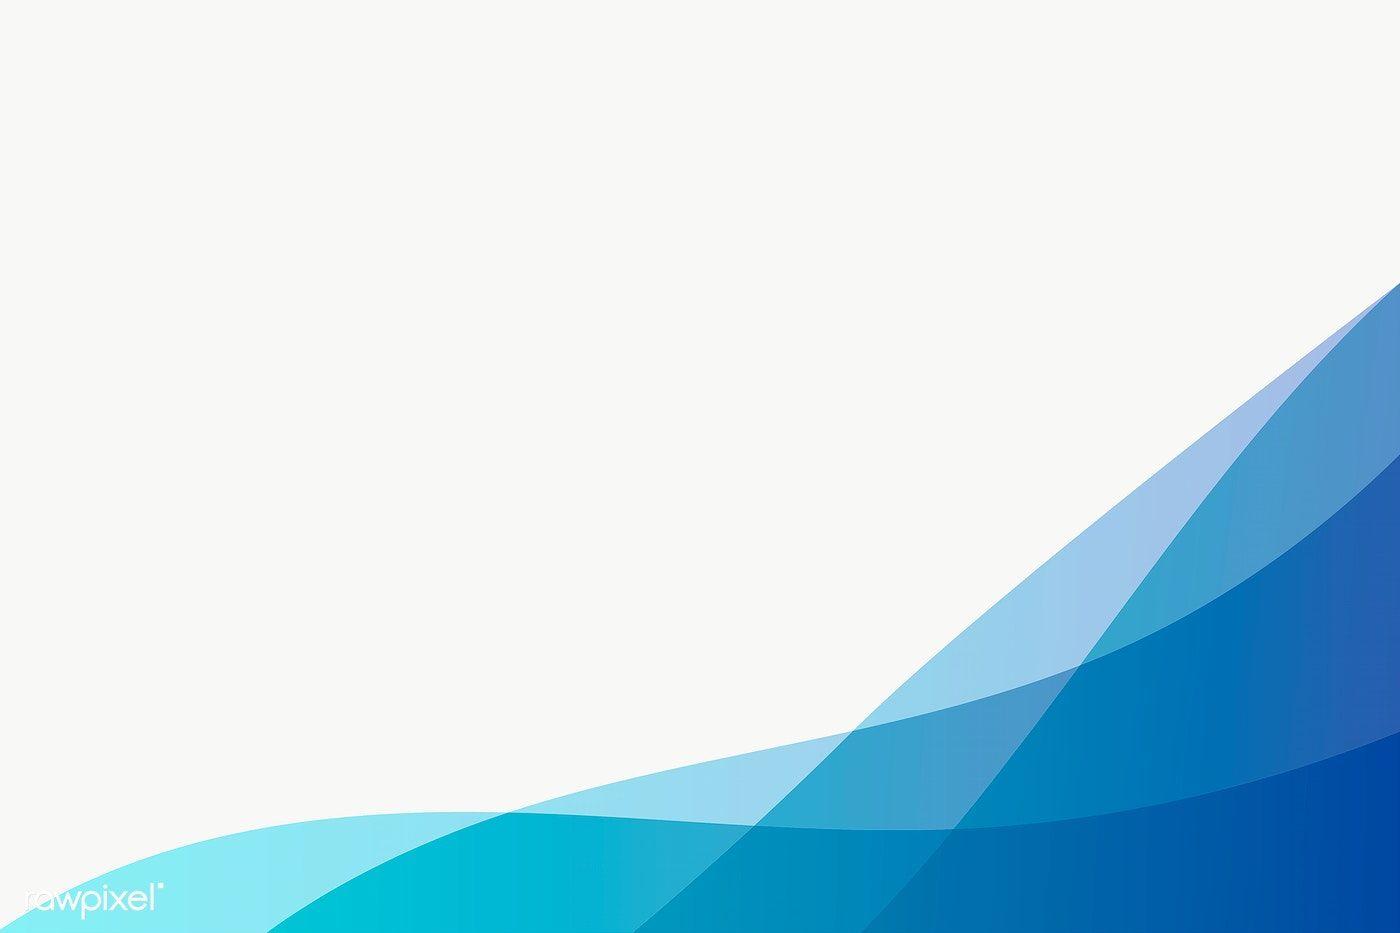 Blue Wave Textured Design Element Free Image By Rawpixel Com Busbus Textured Waves Texture Design Blue Waves